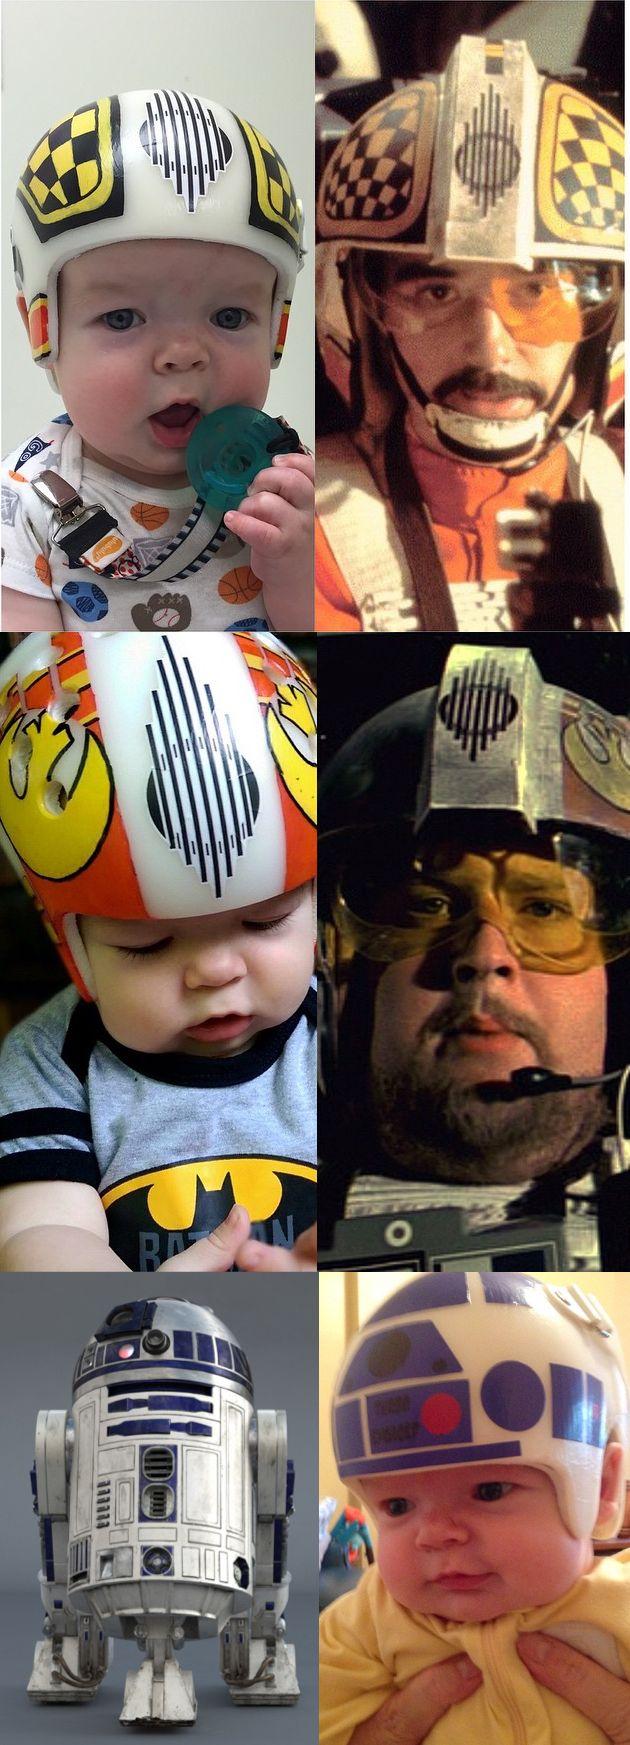 Best Helmet Images On Pinterest Helmets Dads And Star Wars Helmet - Baby helmet decalsbaby helmets lee pinterest creative baby helmet and babies